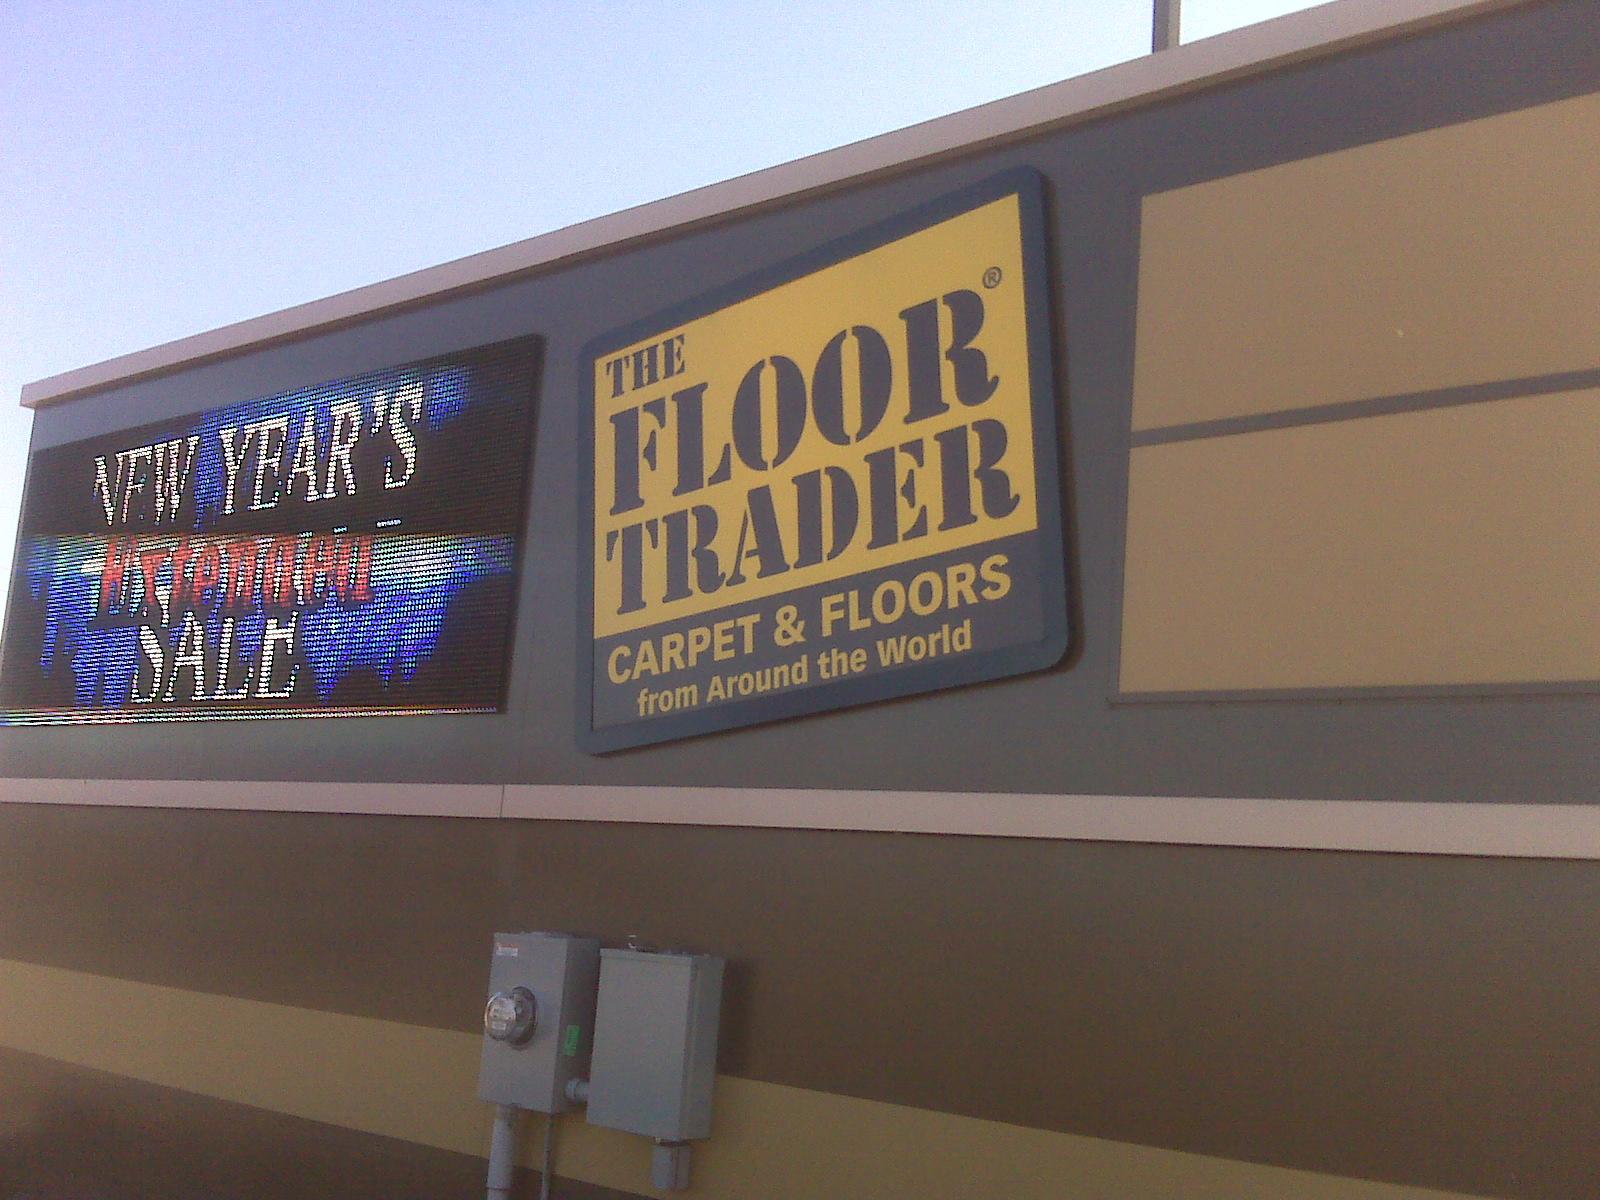 Floor-Trader-St-Louis-James-Mohrmann-2010-01-051